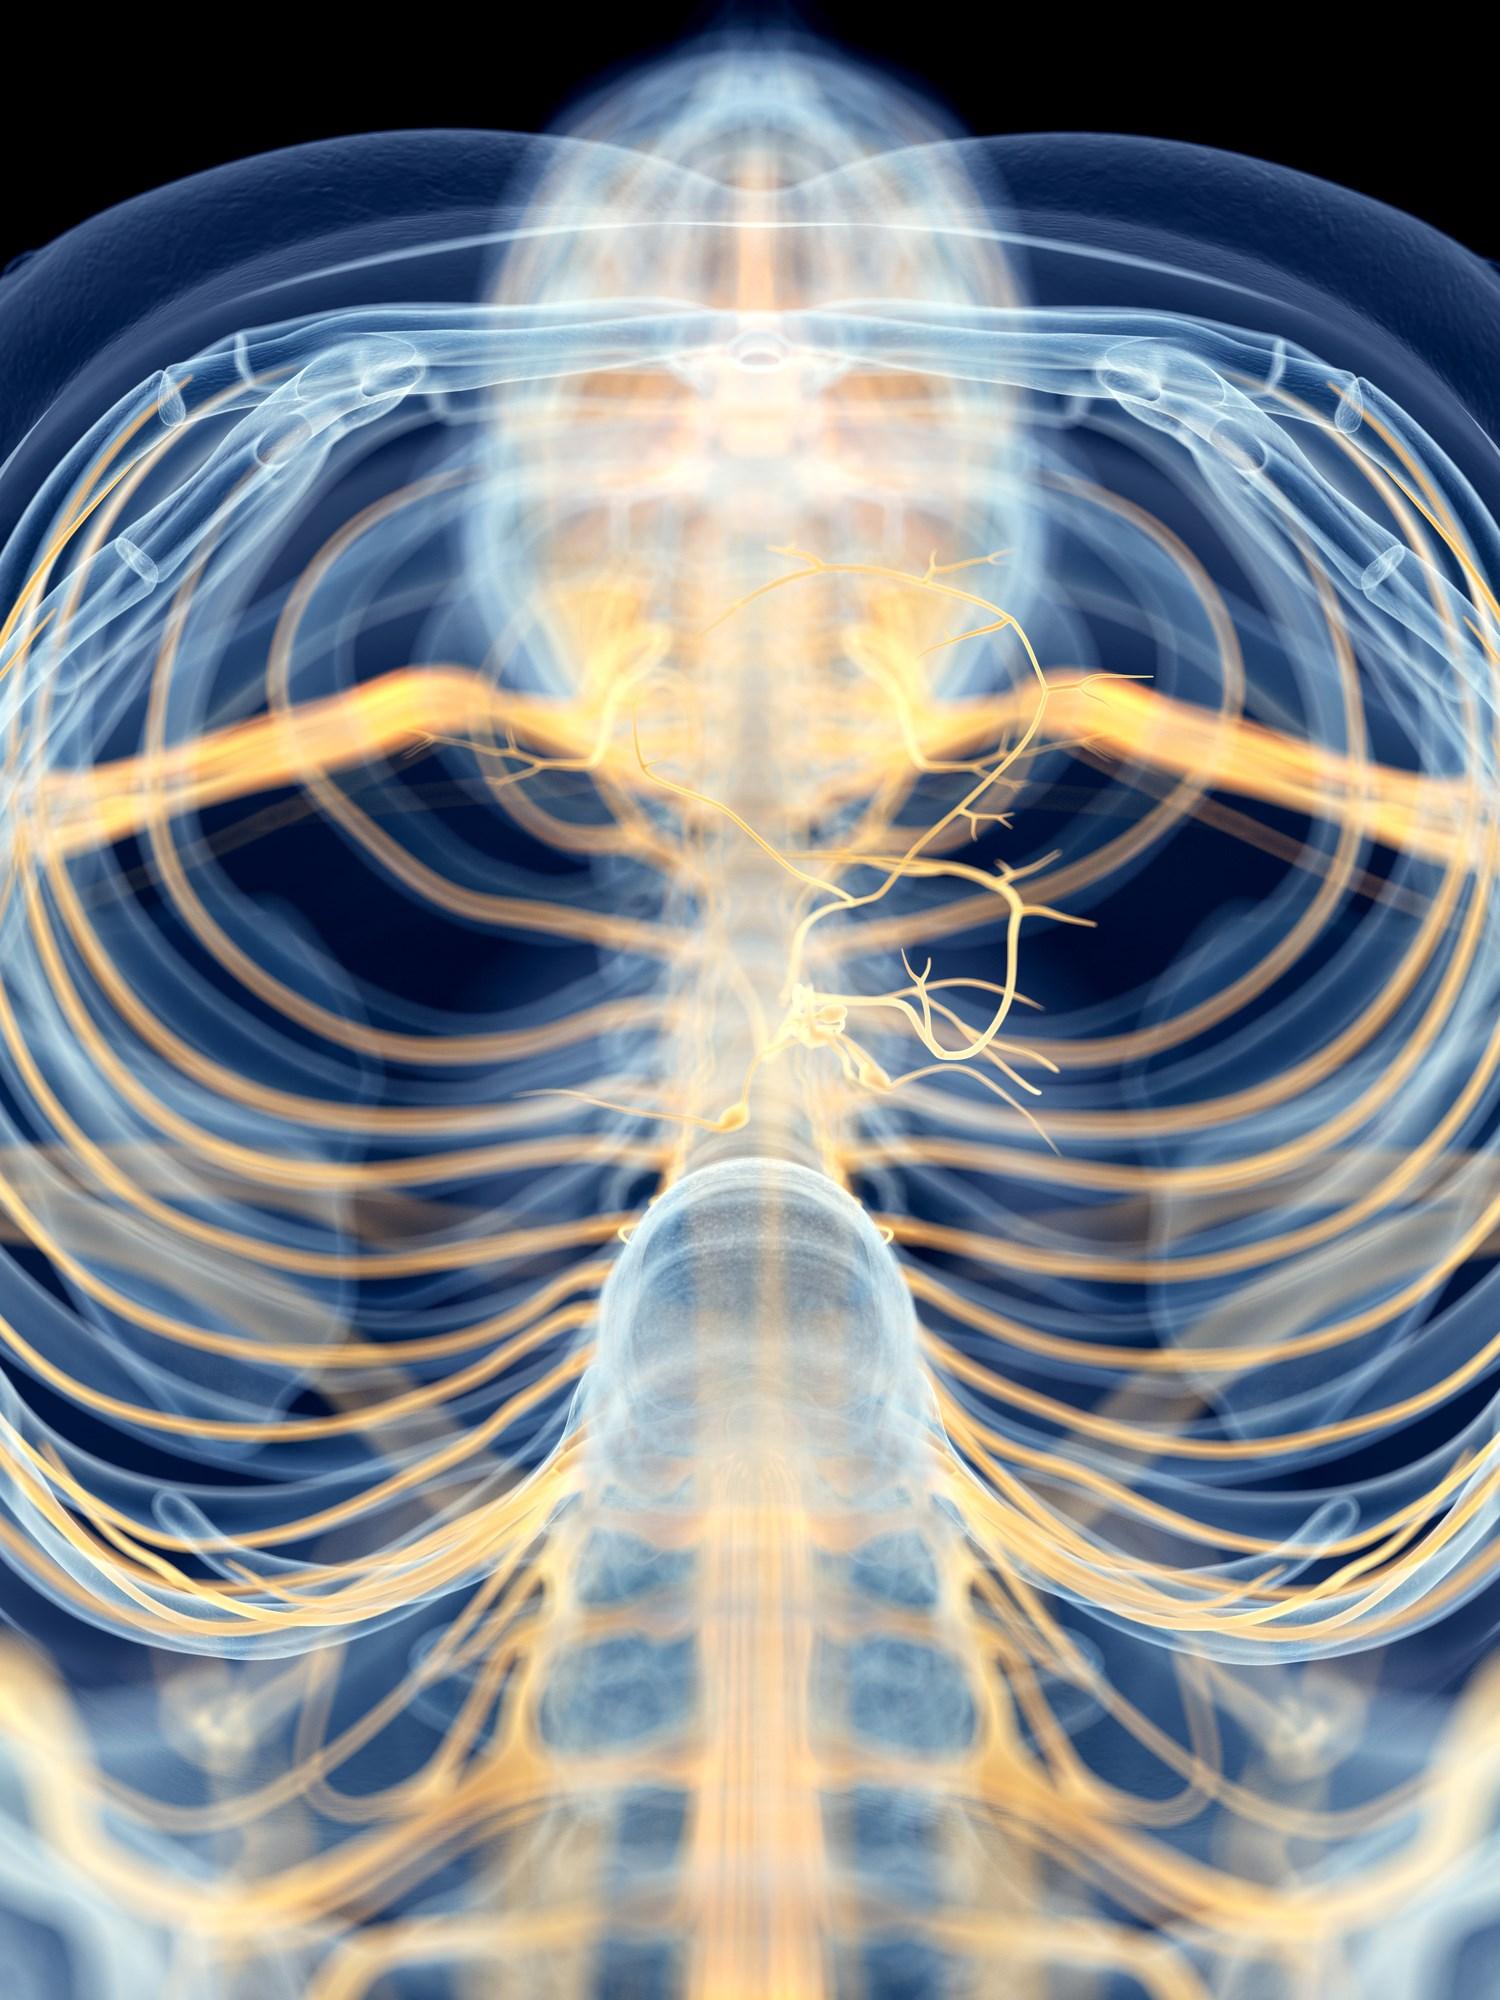 Neurostimulation to Target the Inflammatory Reflex in Rheumatoid Arthritis